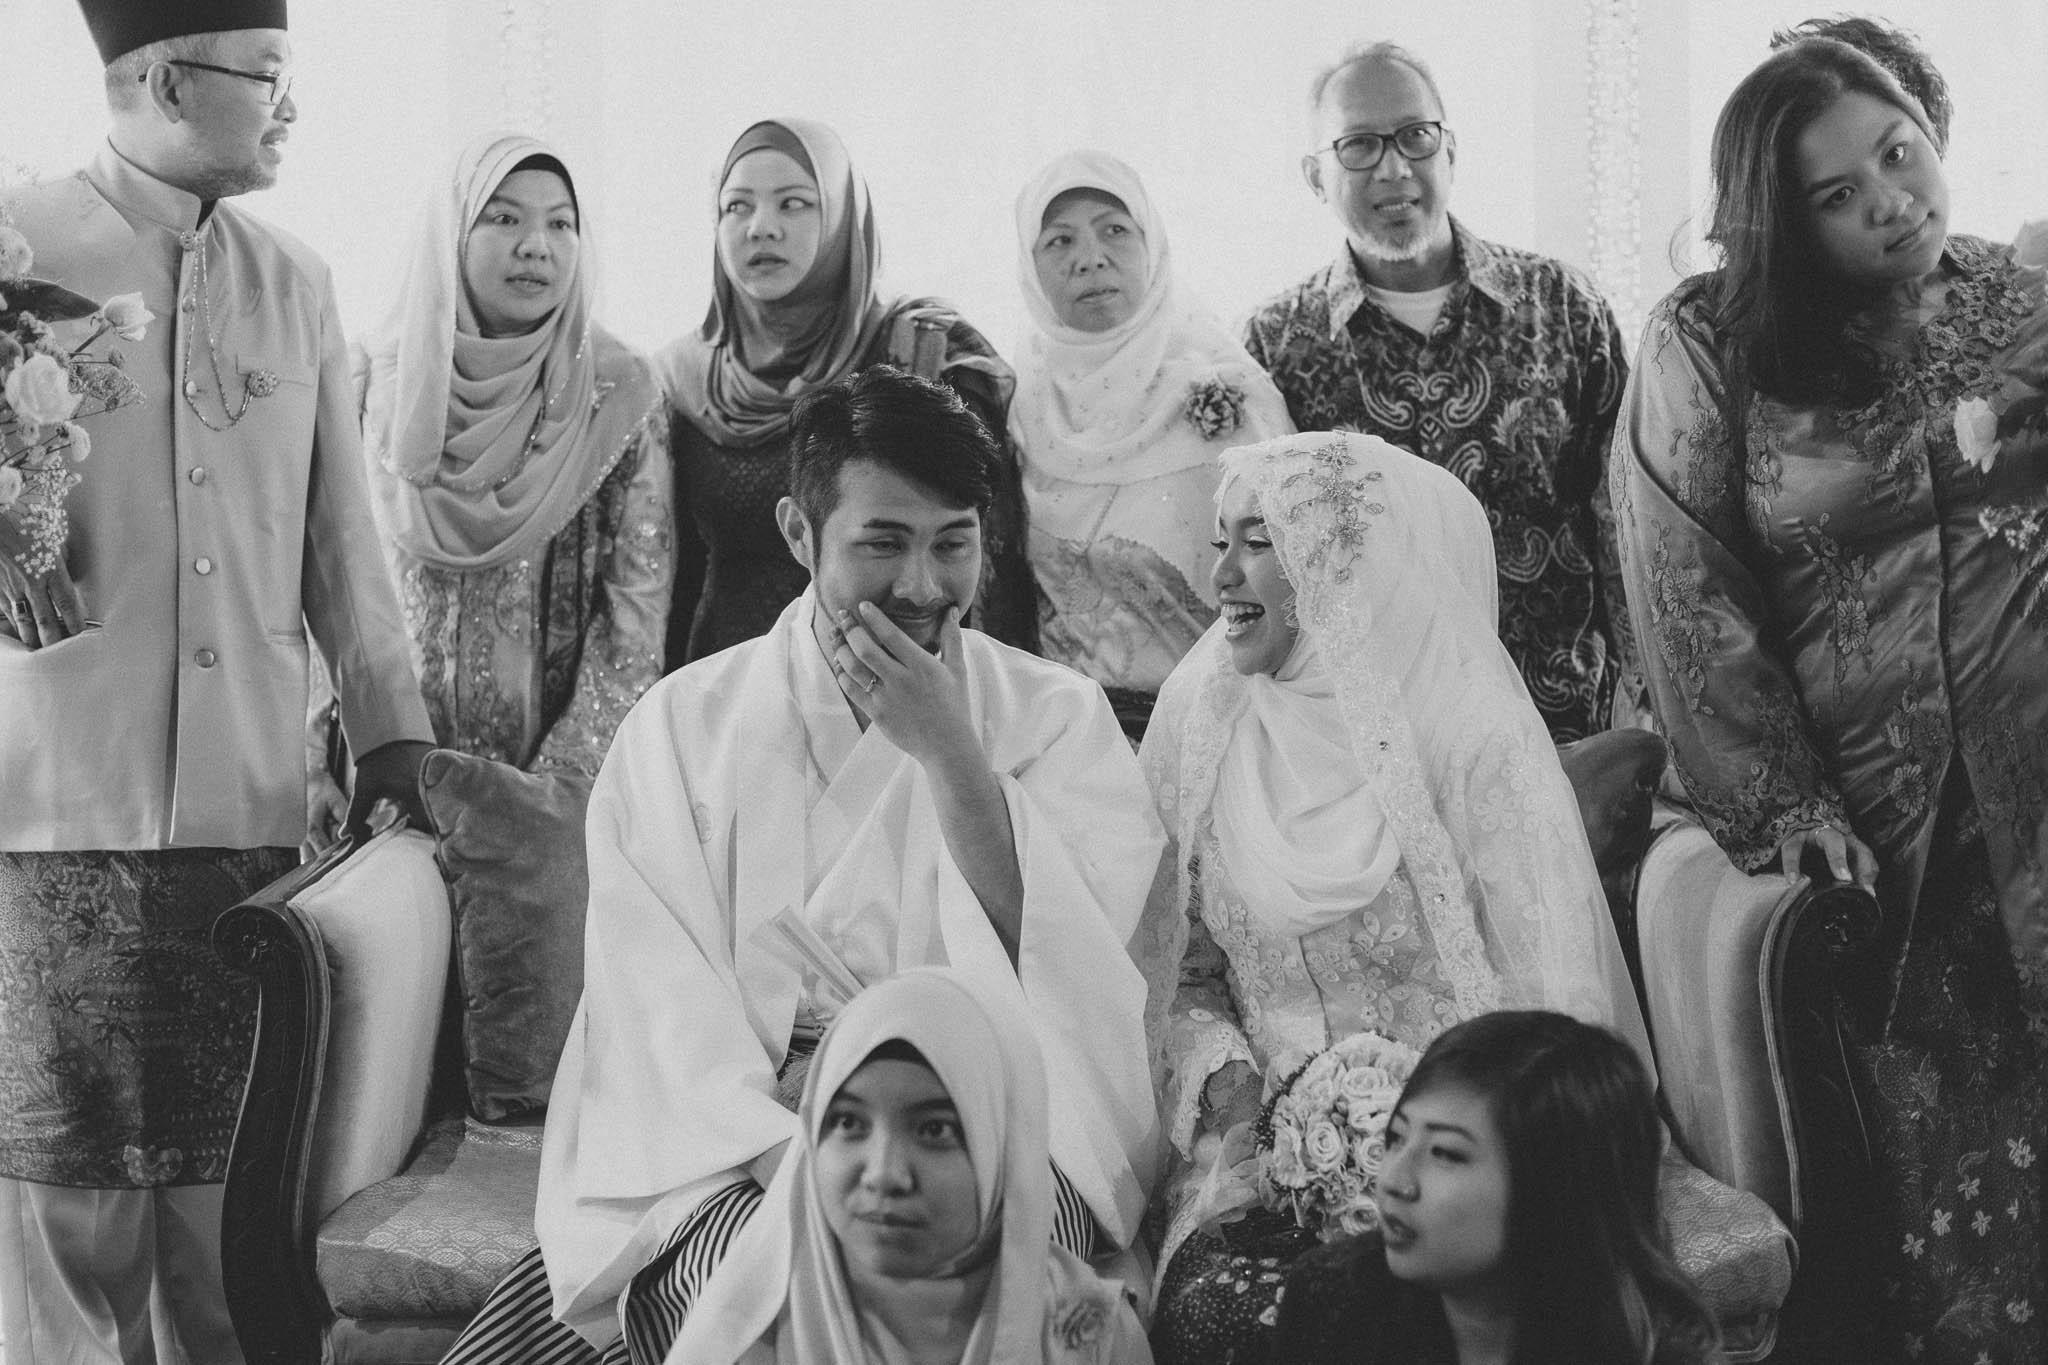 singapore-wedding-photographer-malay-indian-pre-wedding-travel-wmt-2015-21.jpg